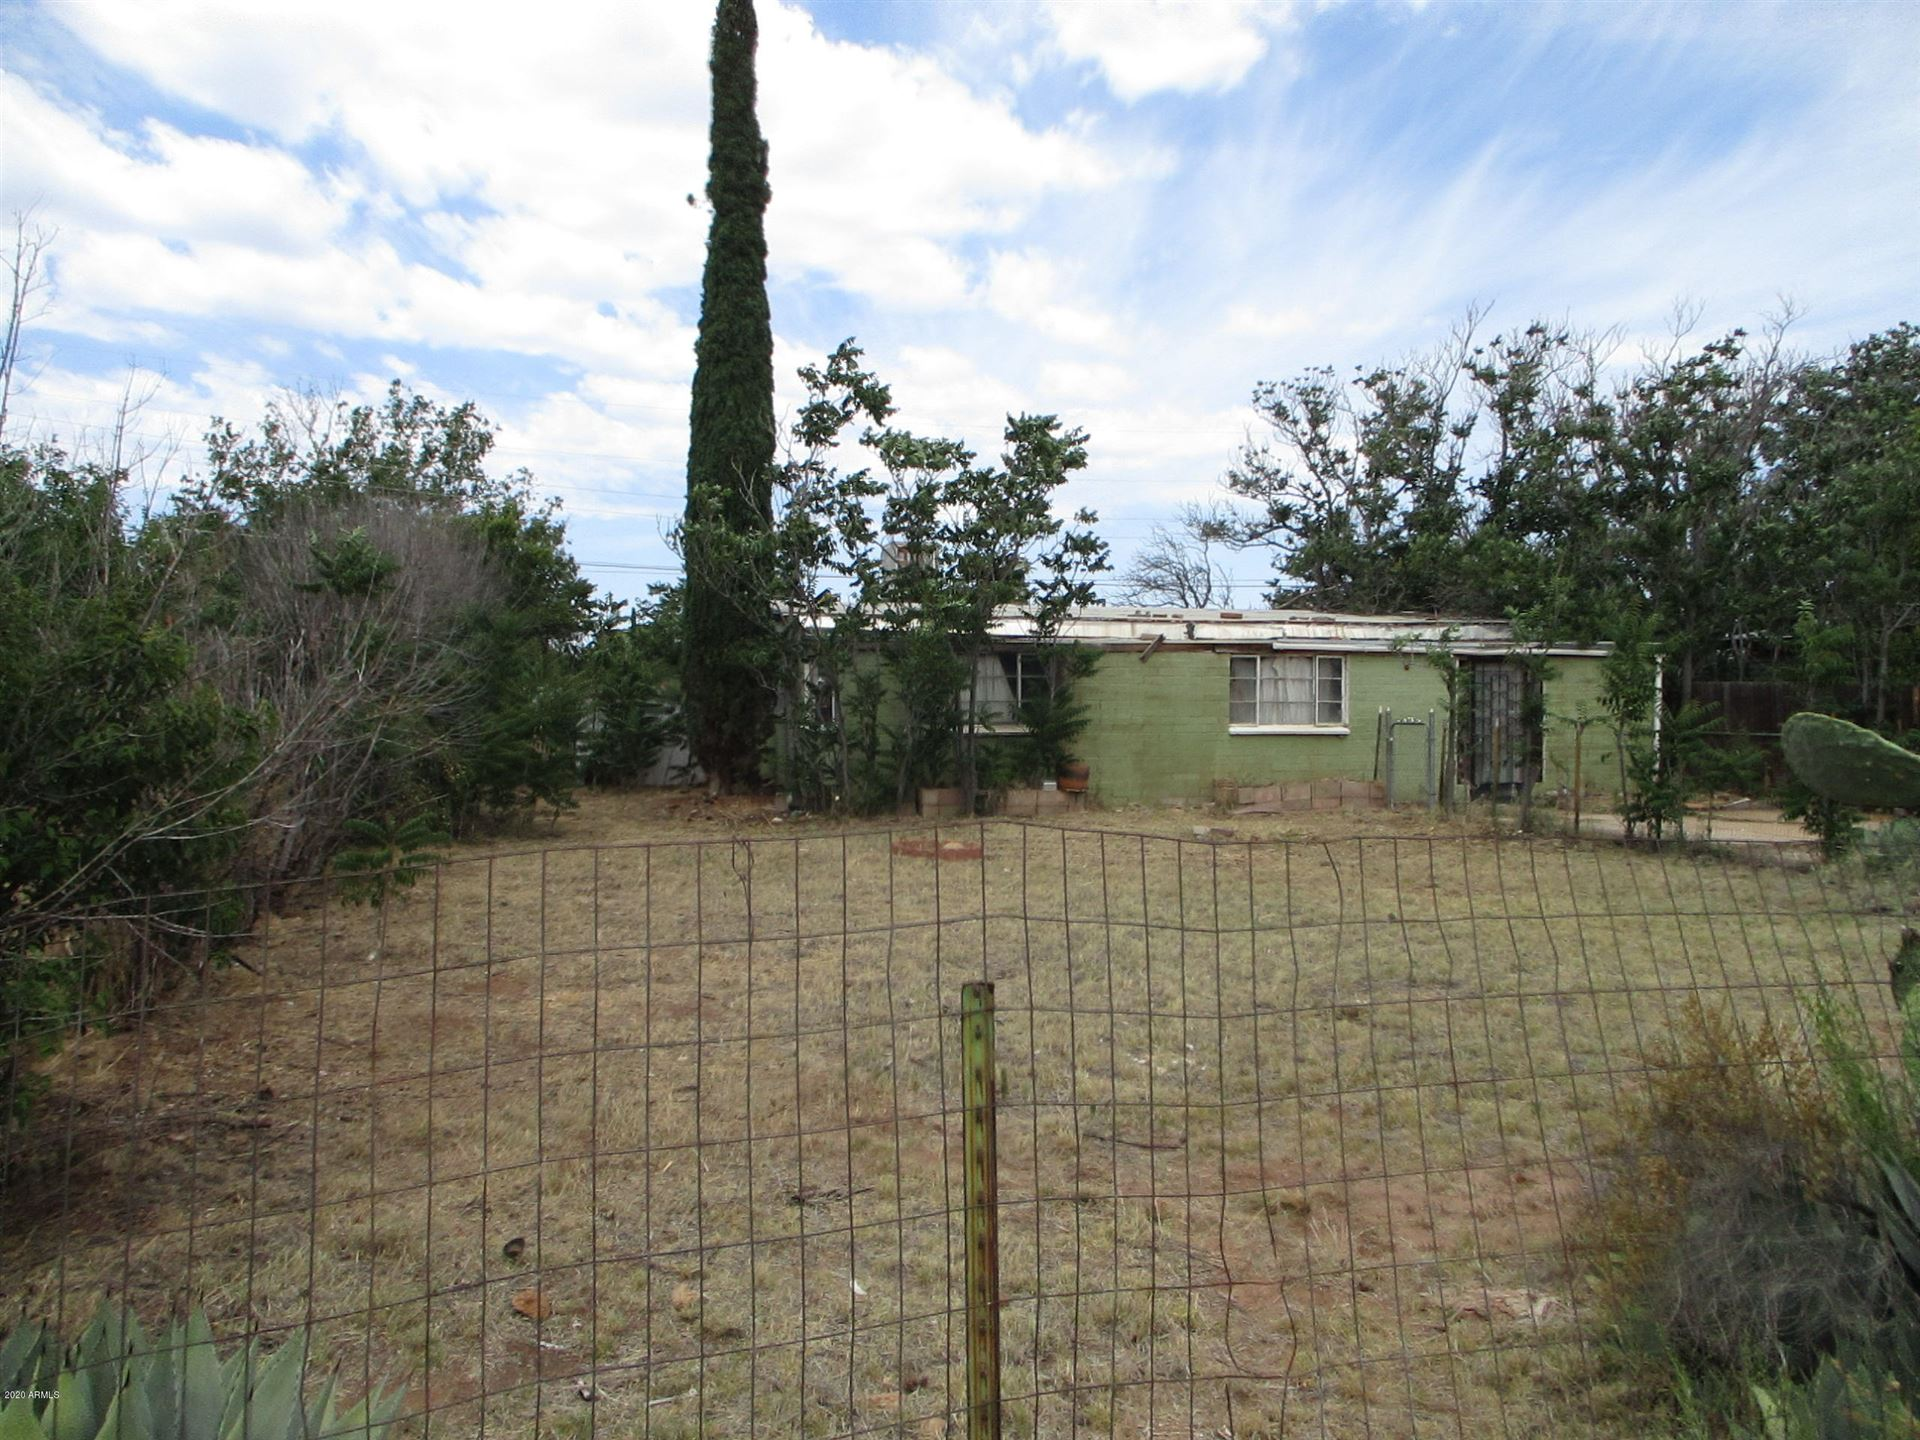 208 N 3RD Street, Sierra Vista, AZ 85635 - MLS#: 6095519